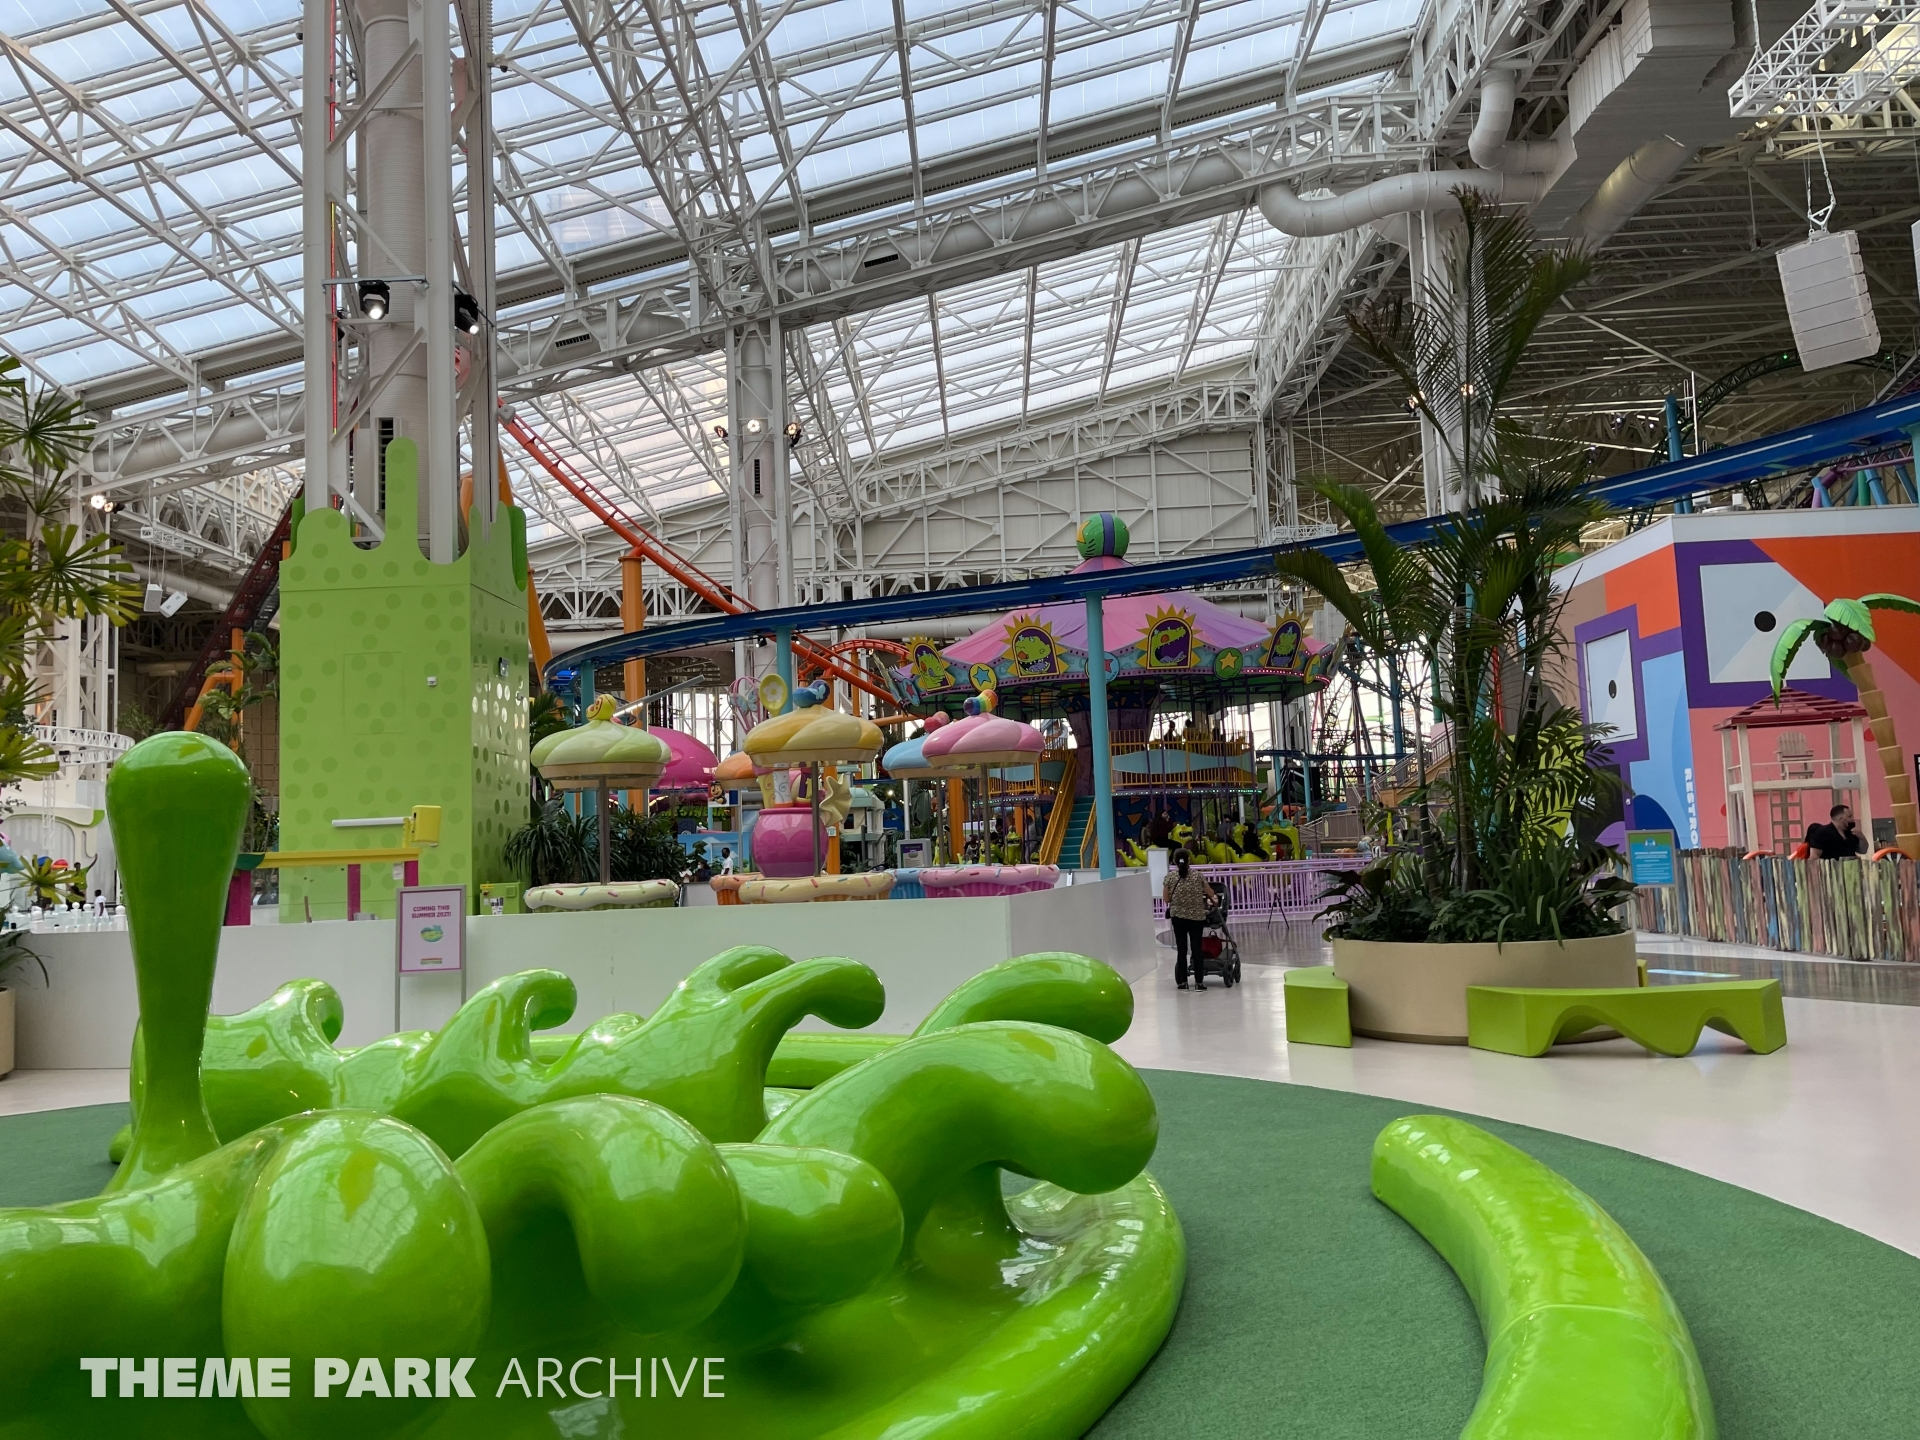 Dora's Sky Railway at Nickelodeon Universe at American Dream